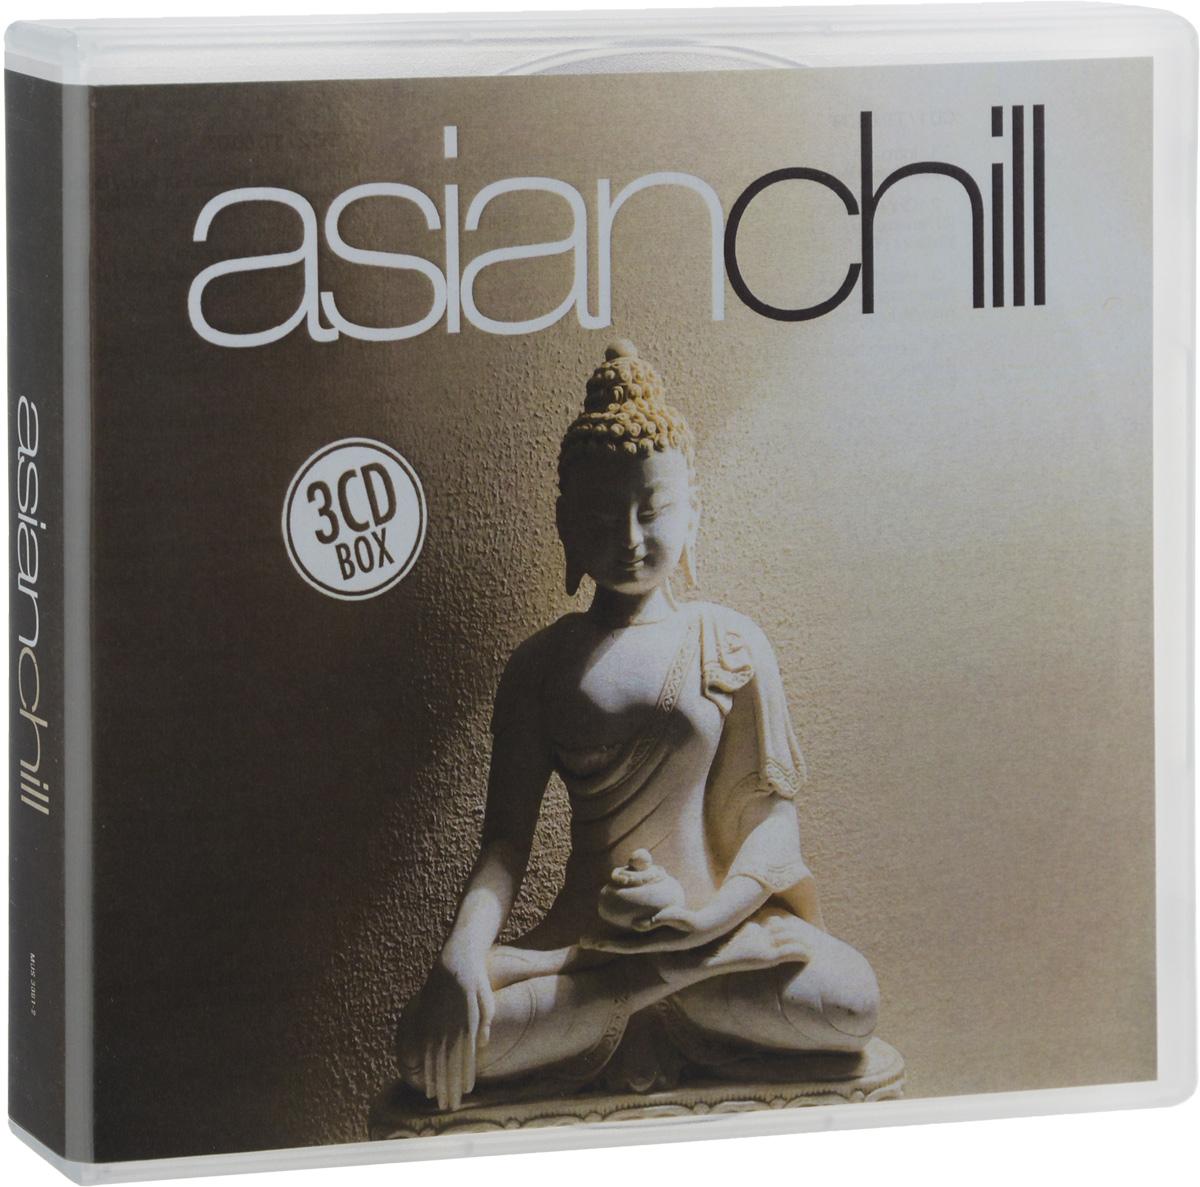 Asian Chill (3 CD) 2015 3 Audio CD